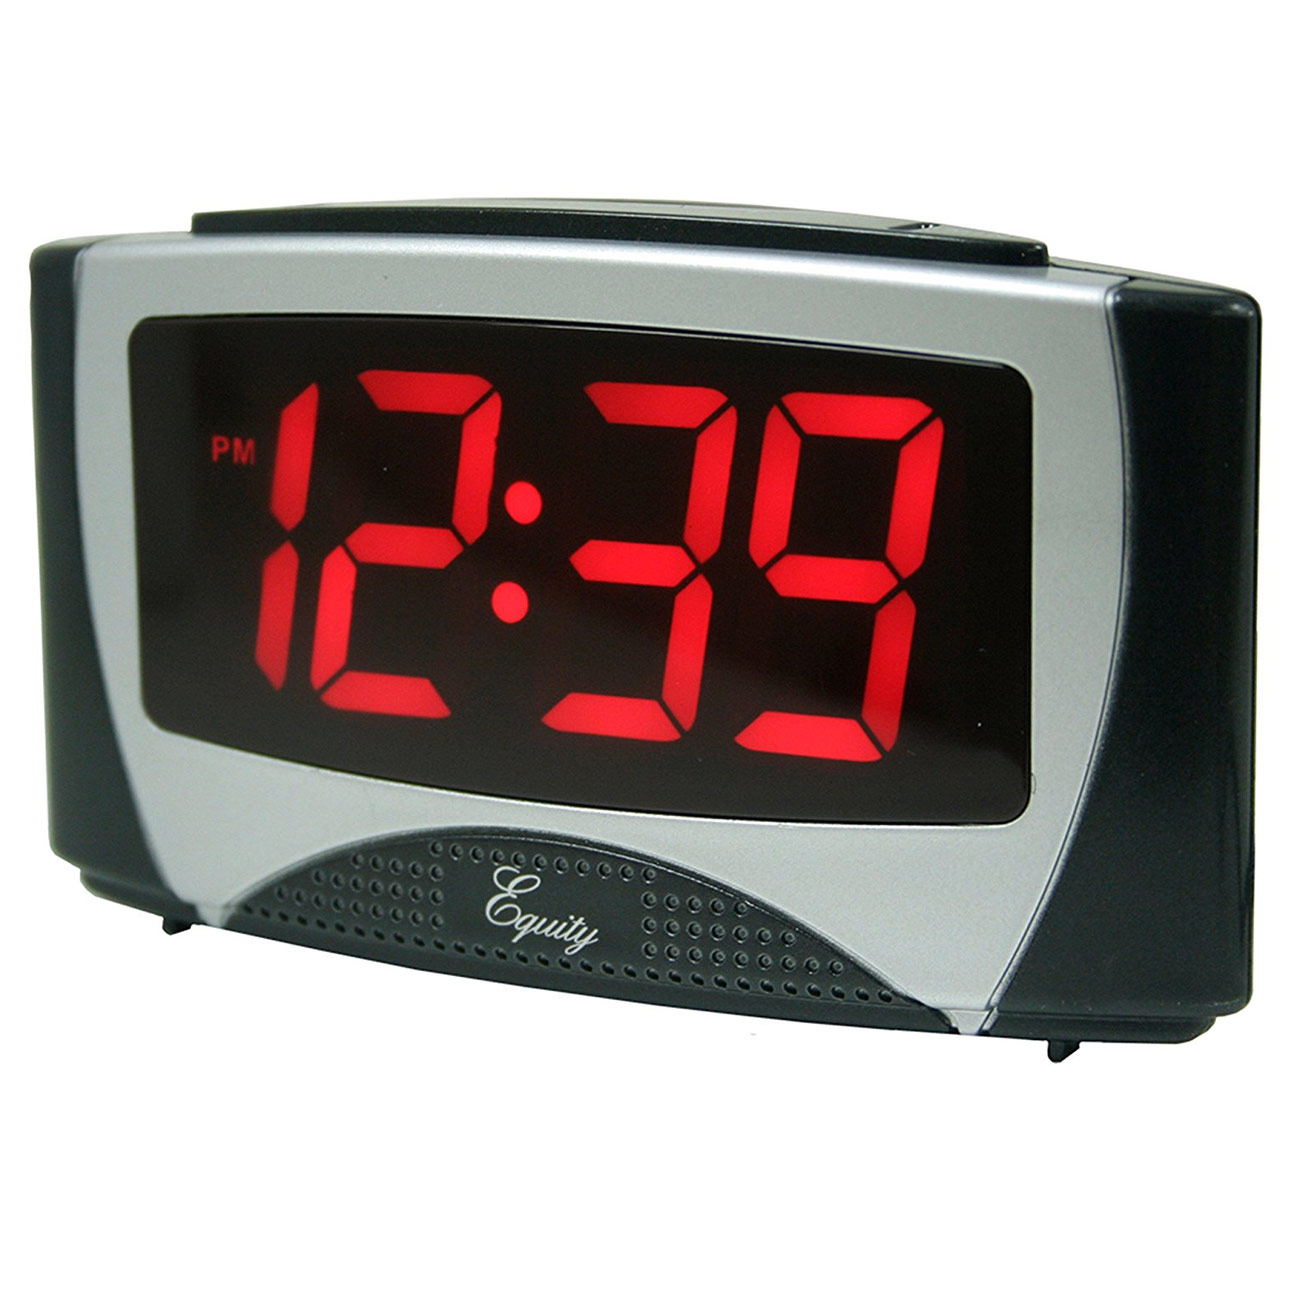 Low Vision Digital Alarm Clock with Jumbo 1.2-inch LED Display